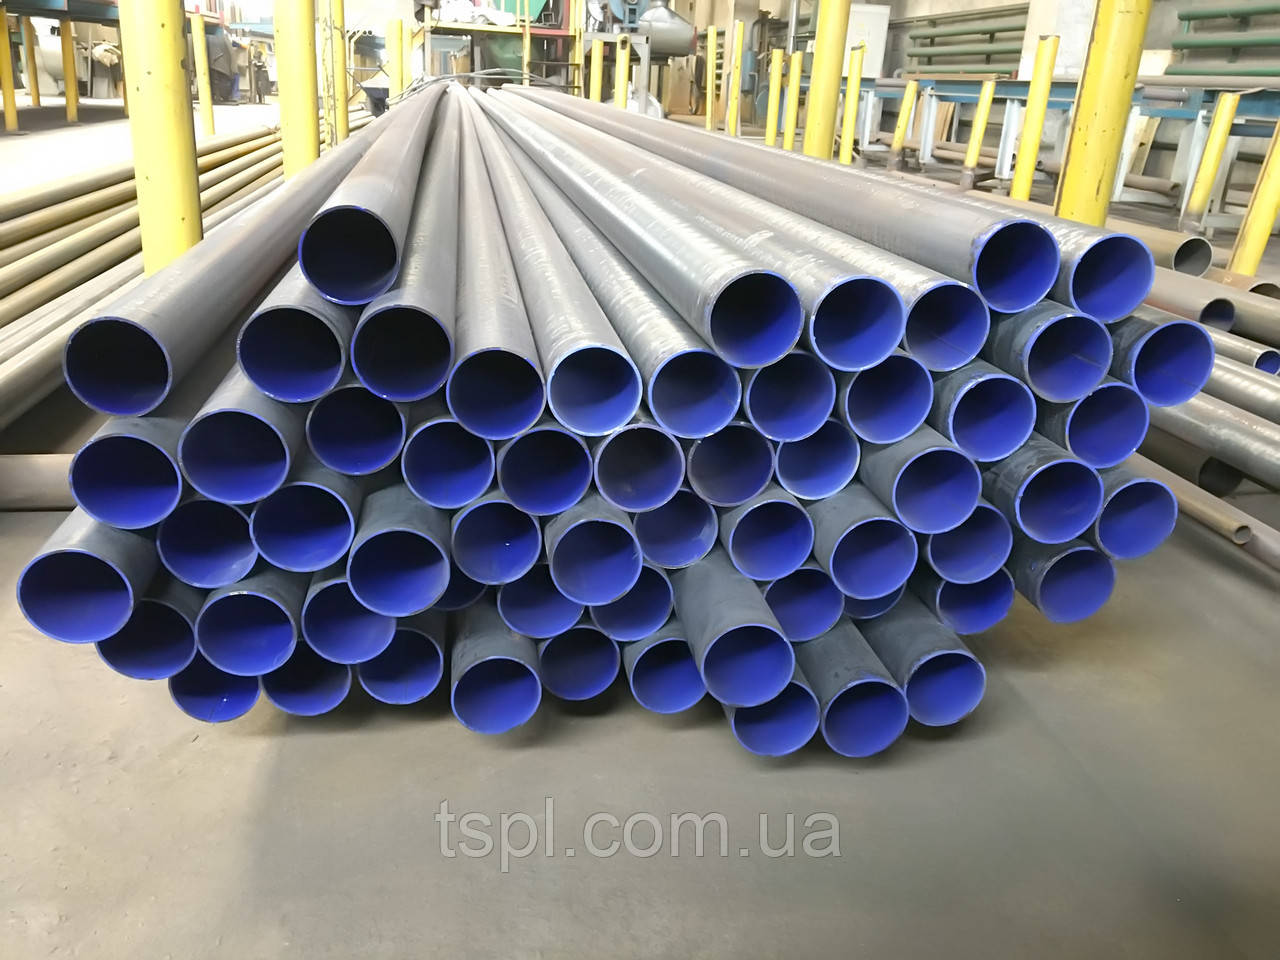 Труба сталева ГОСТ 3262-75, Ду 25 емальована